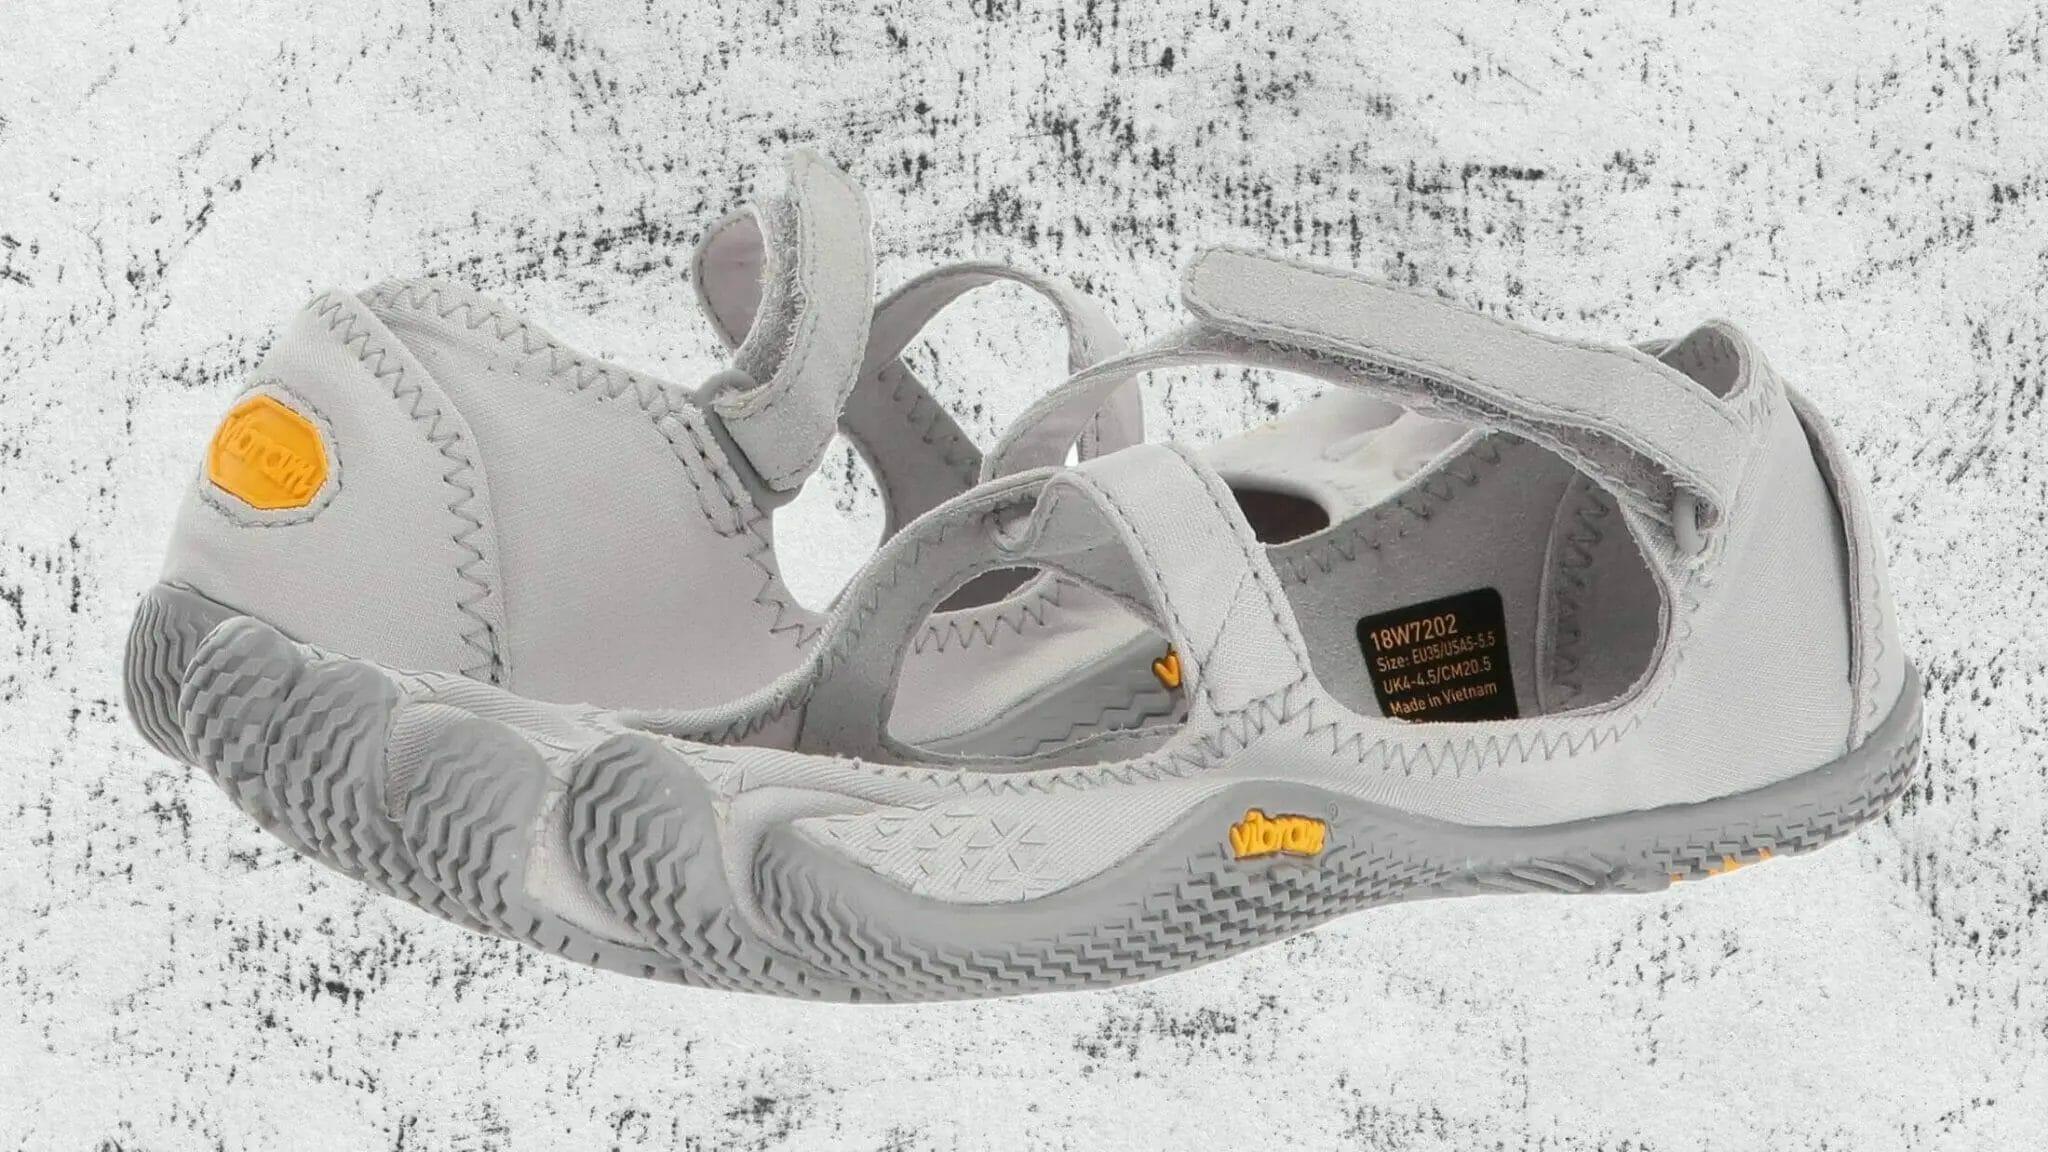 Vibram V-Soul FiveFingers studio shoes with double velcro strap.